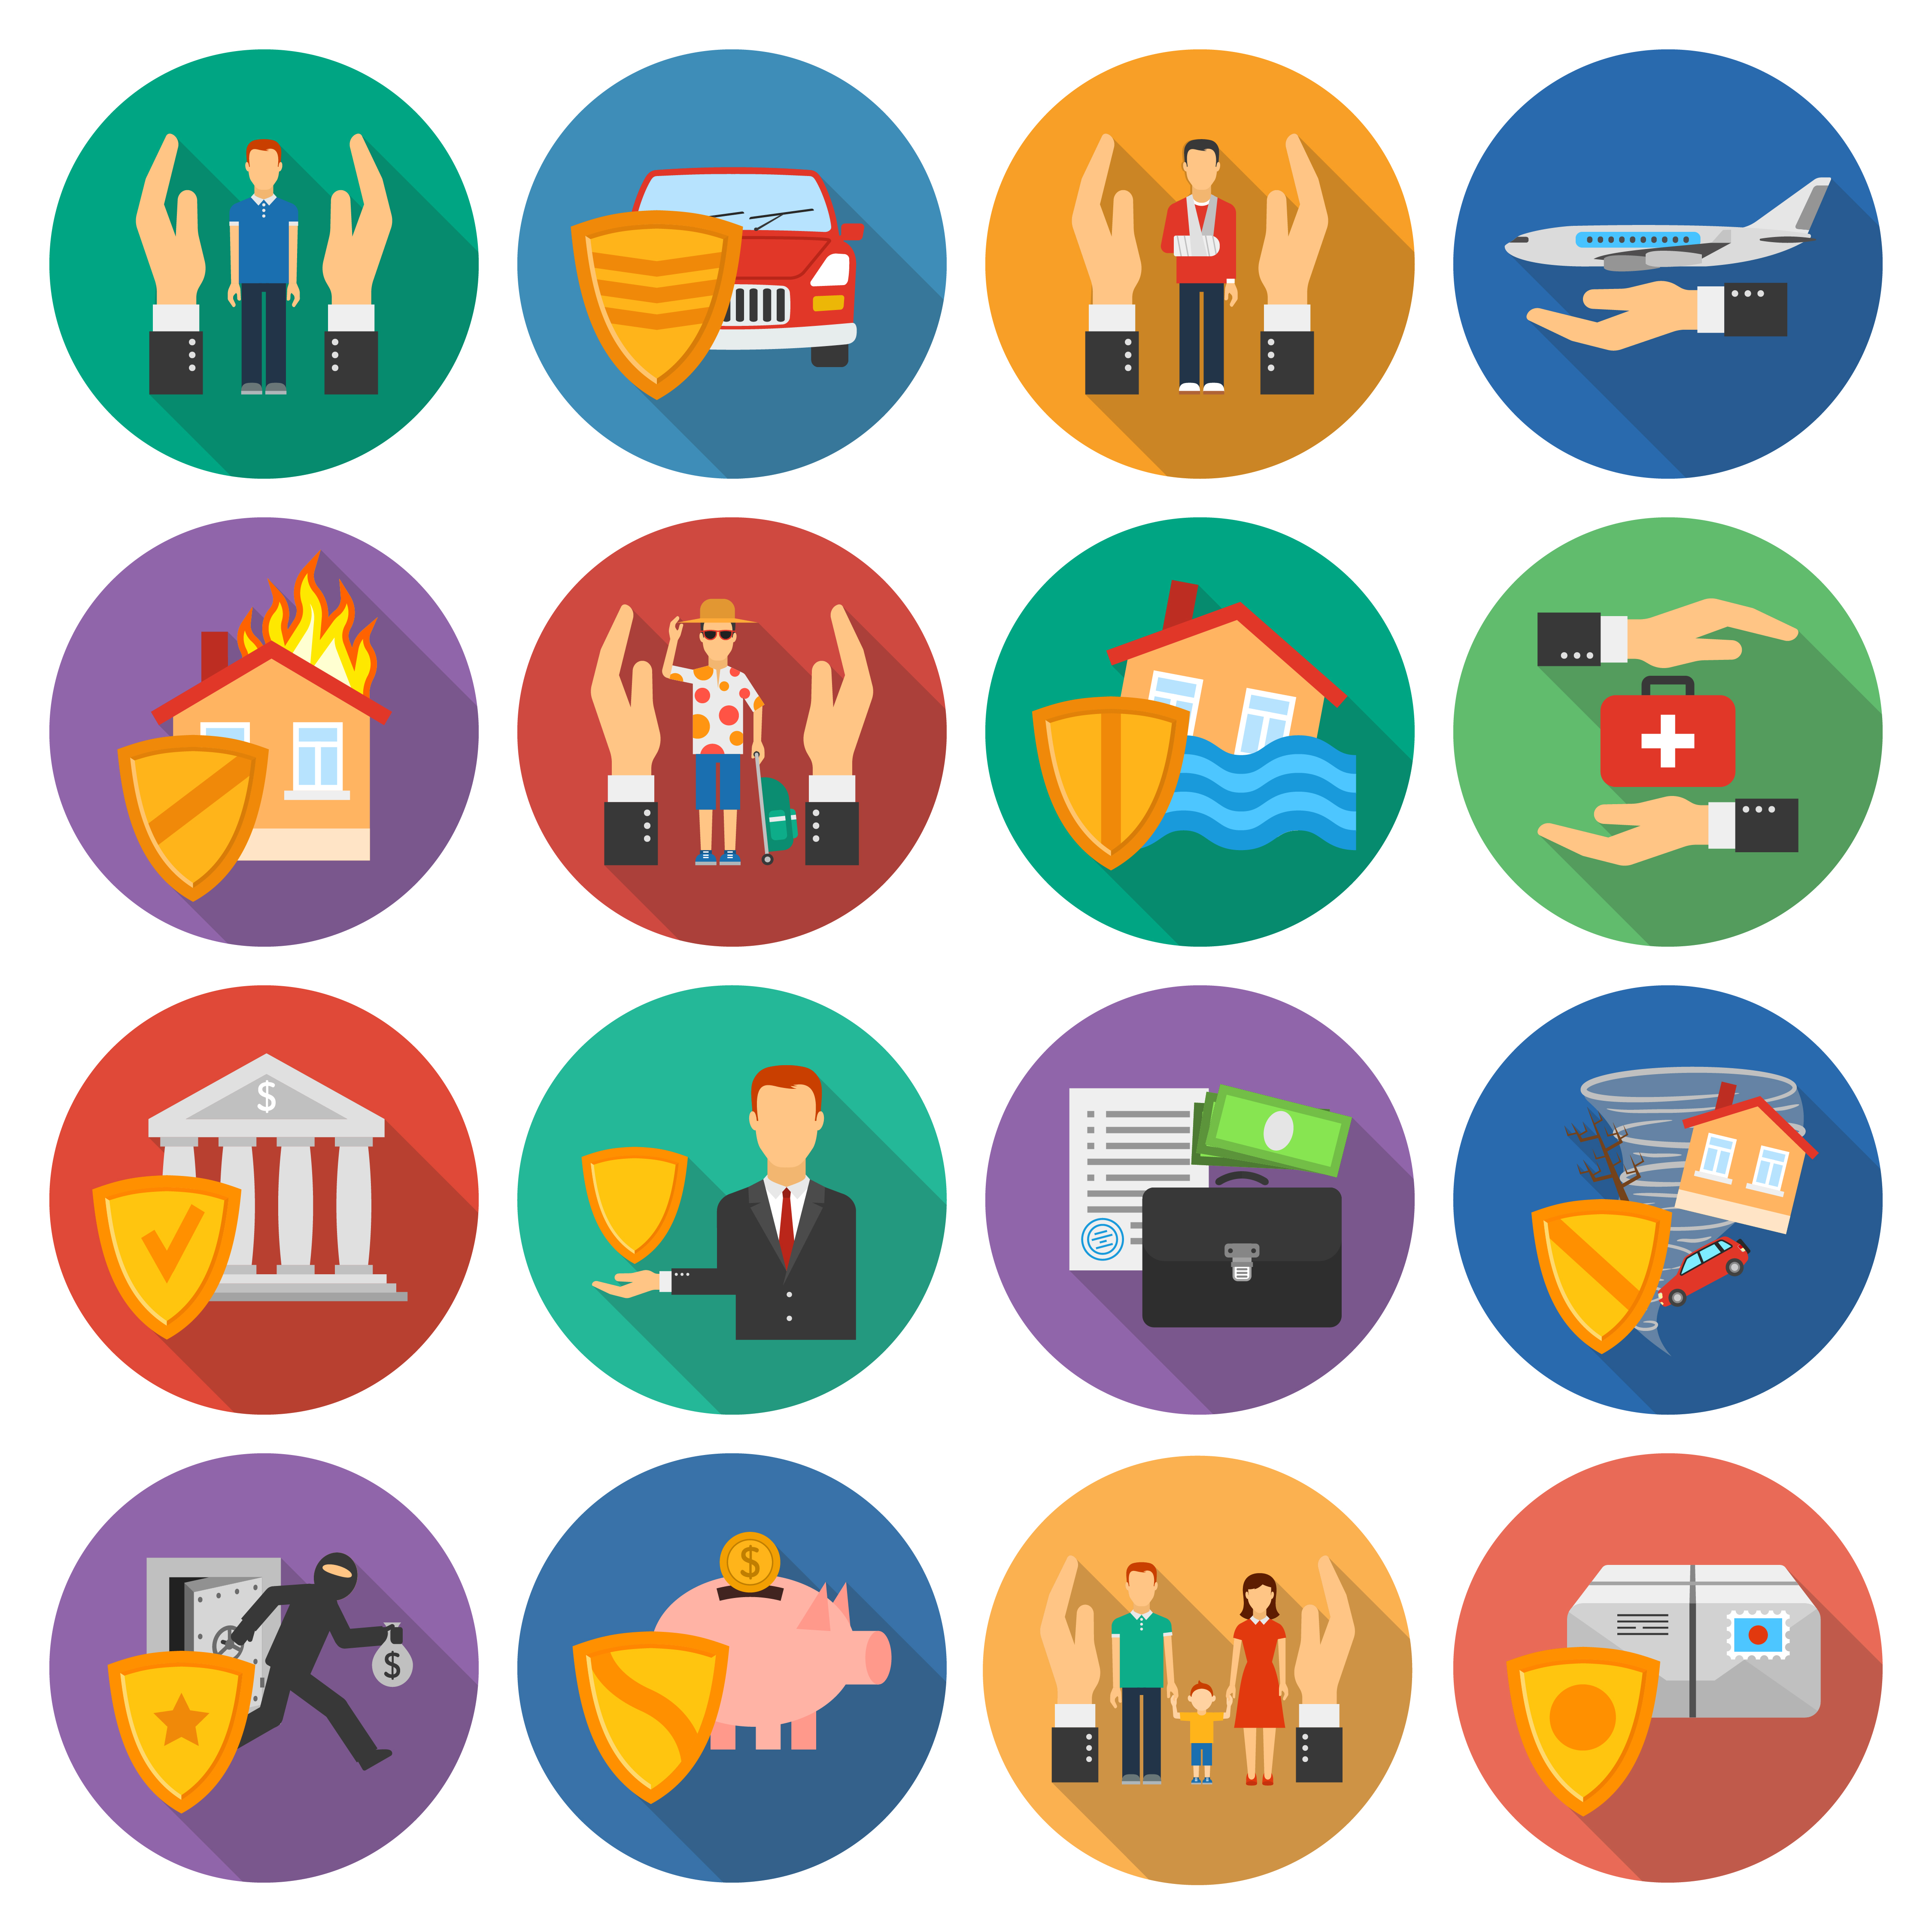 Insurance icons set - Download Free Vectors, Clipart ...